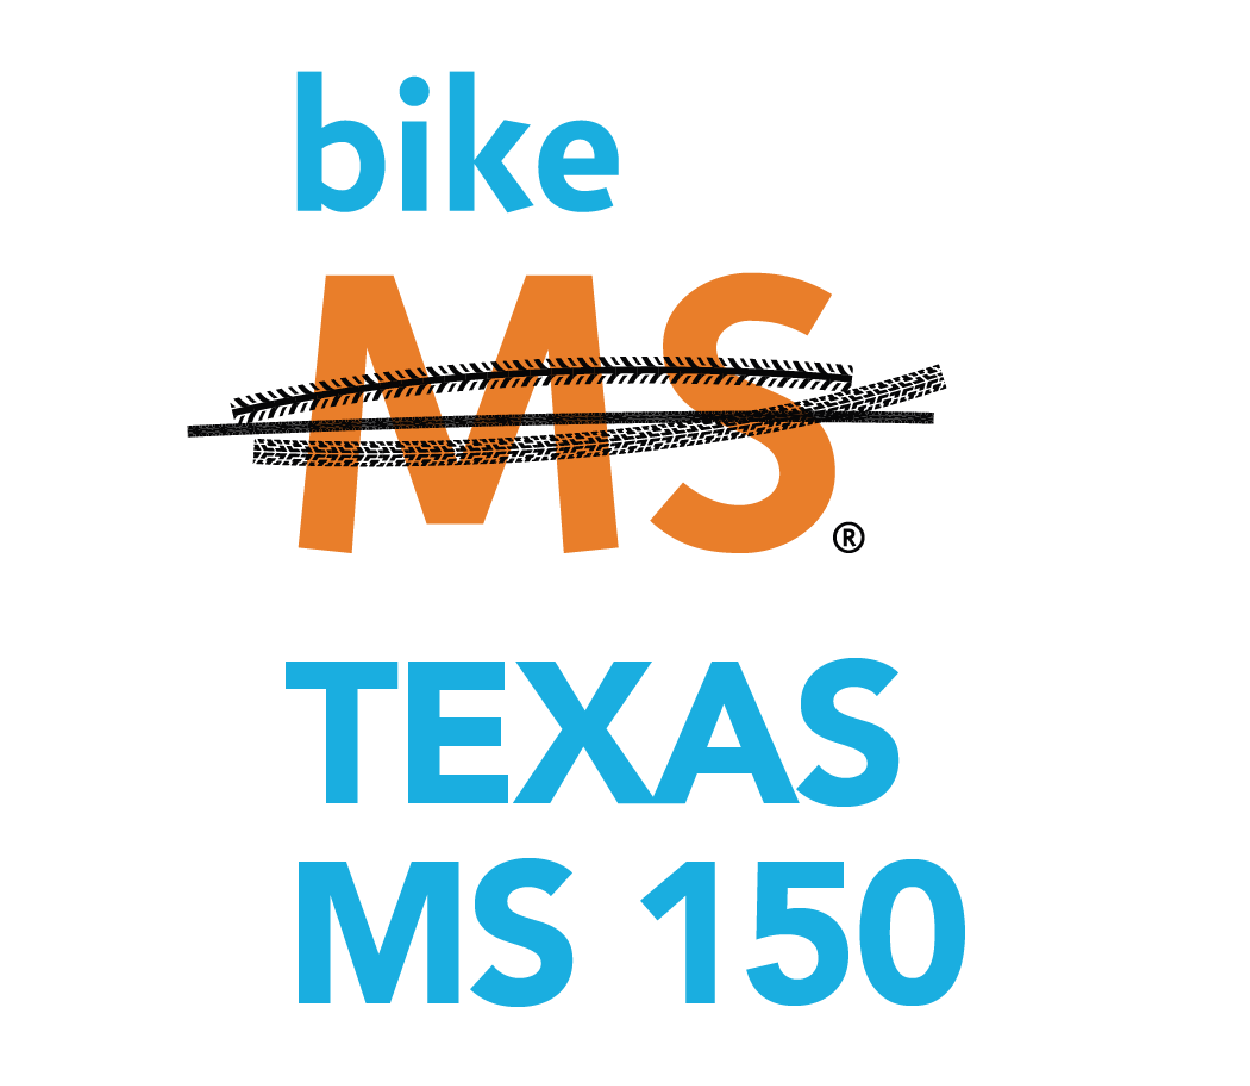 https://getztransportsolutions.com/wp-content/uploads/2021/05/Bike-MS-150-Texas-Logo-01.png